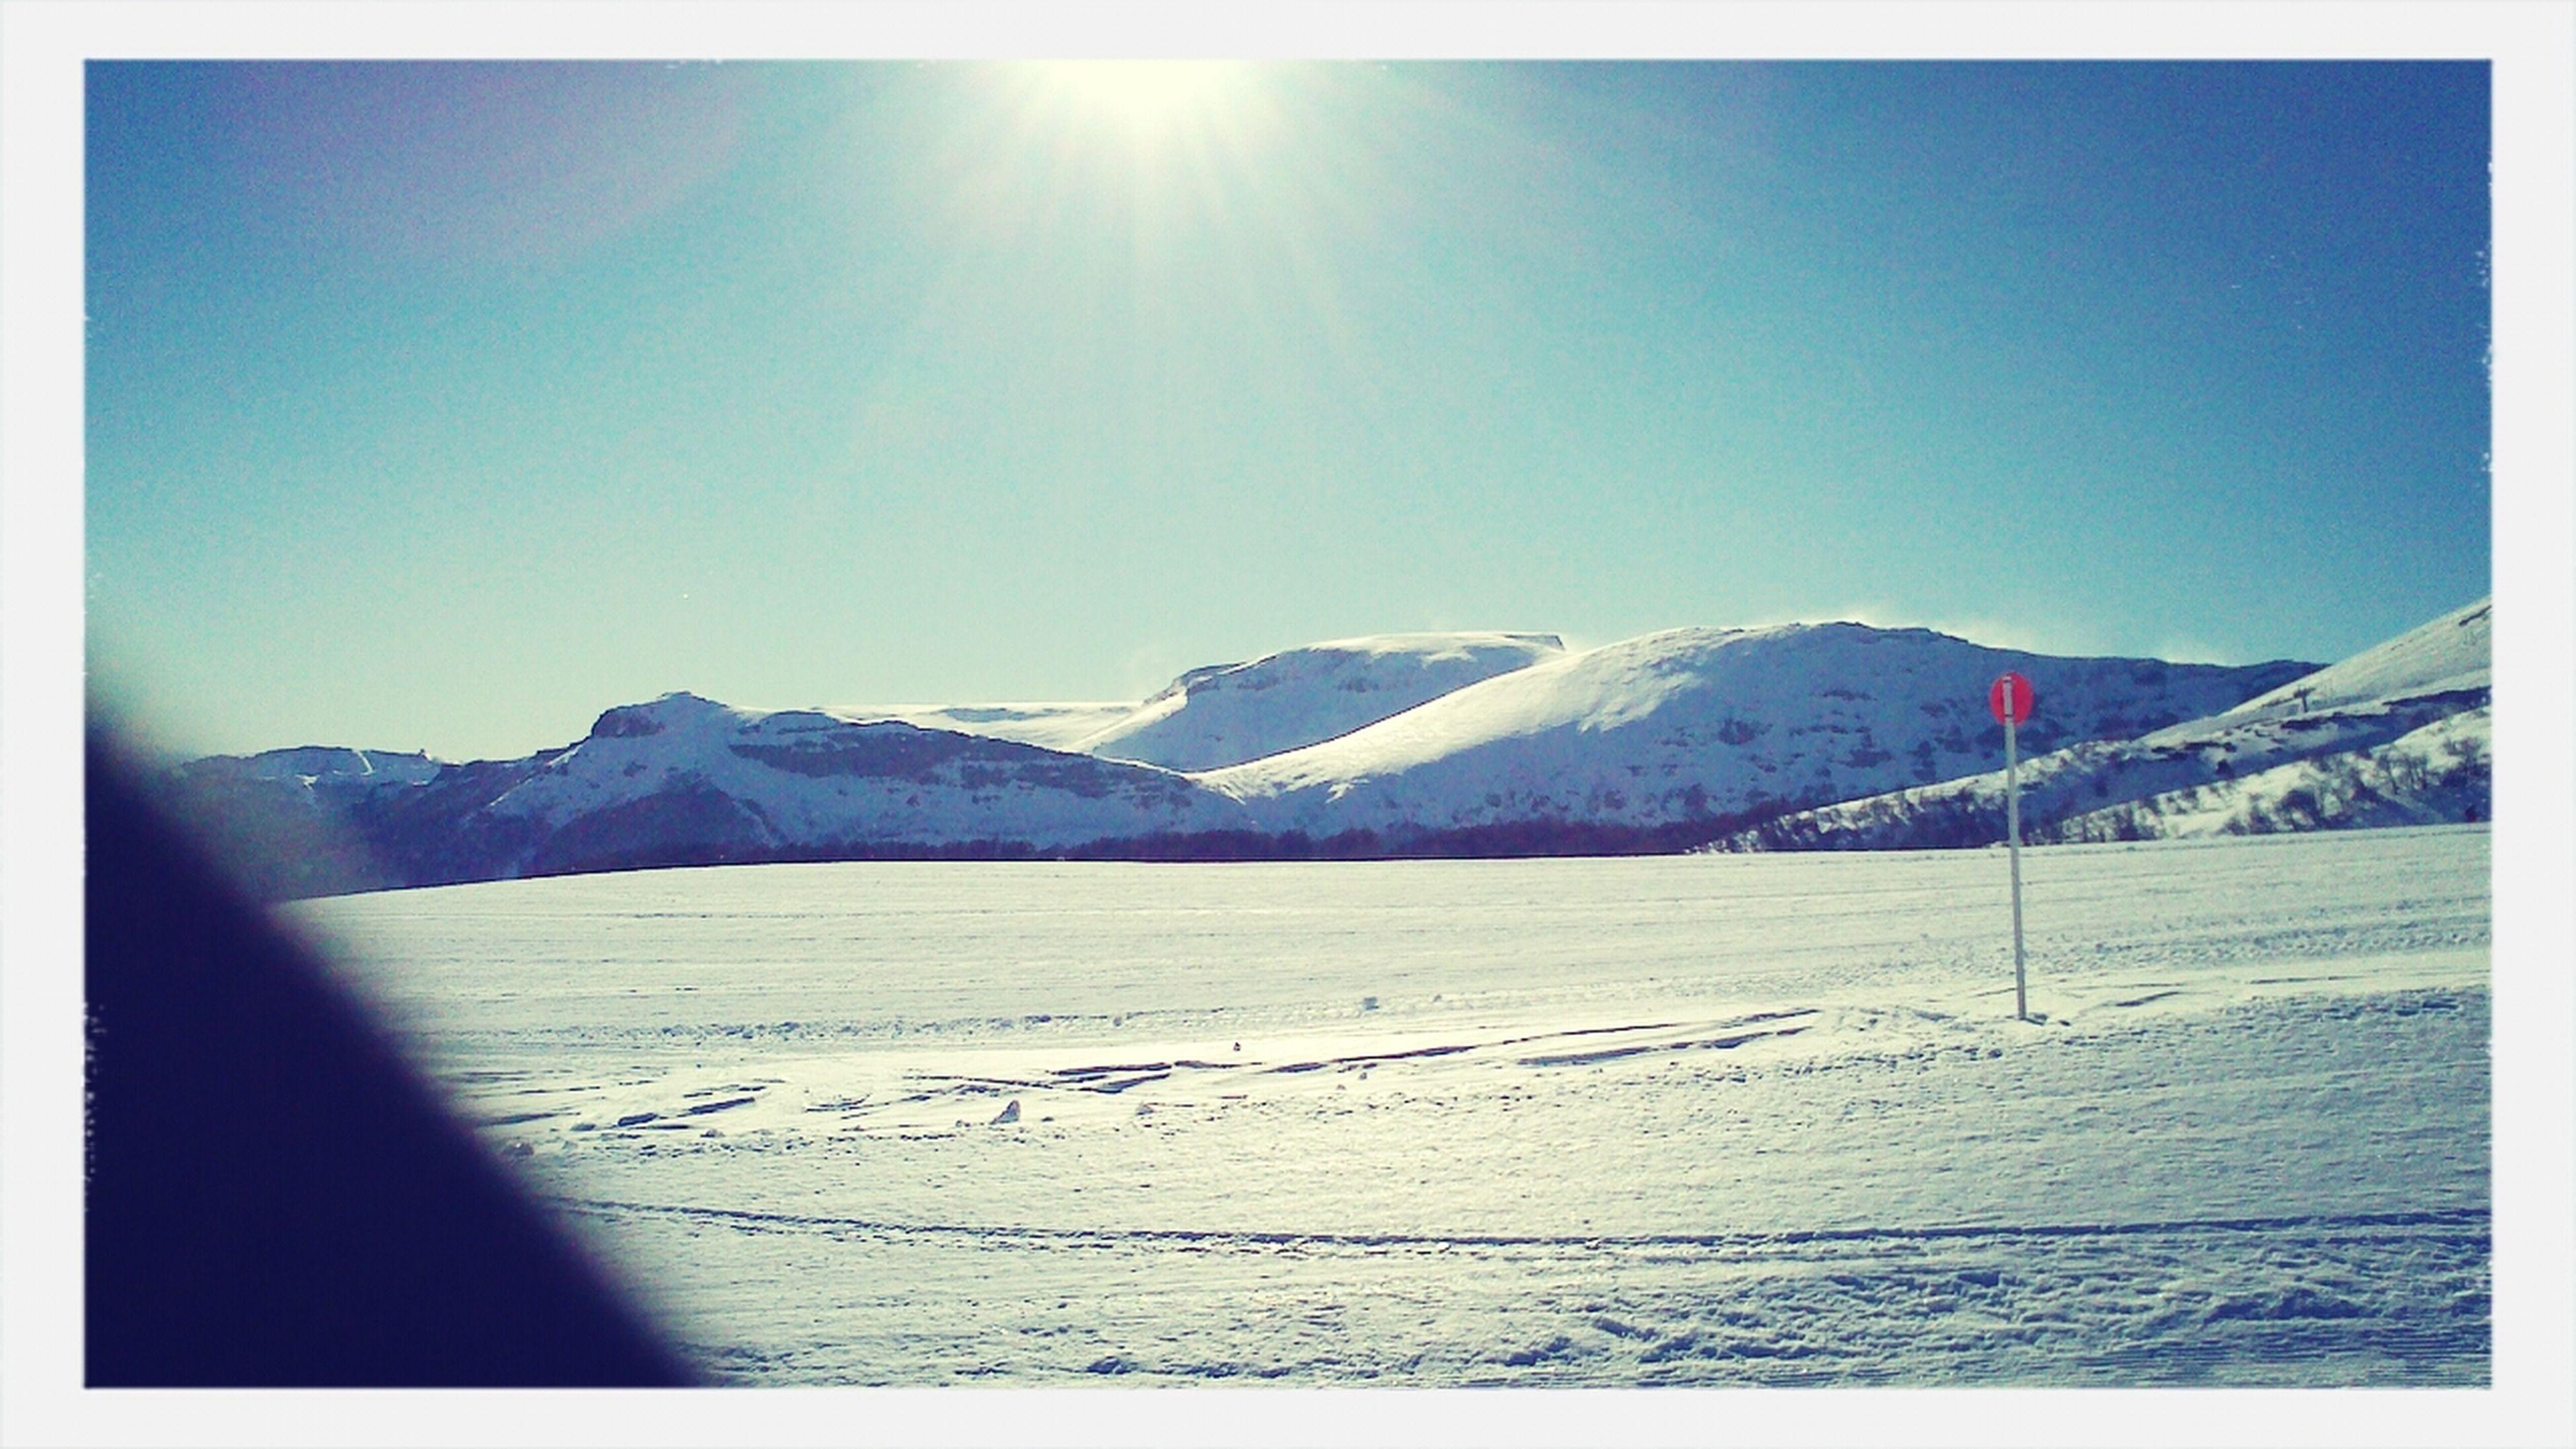 la hermosura de la montaña